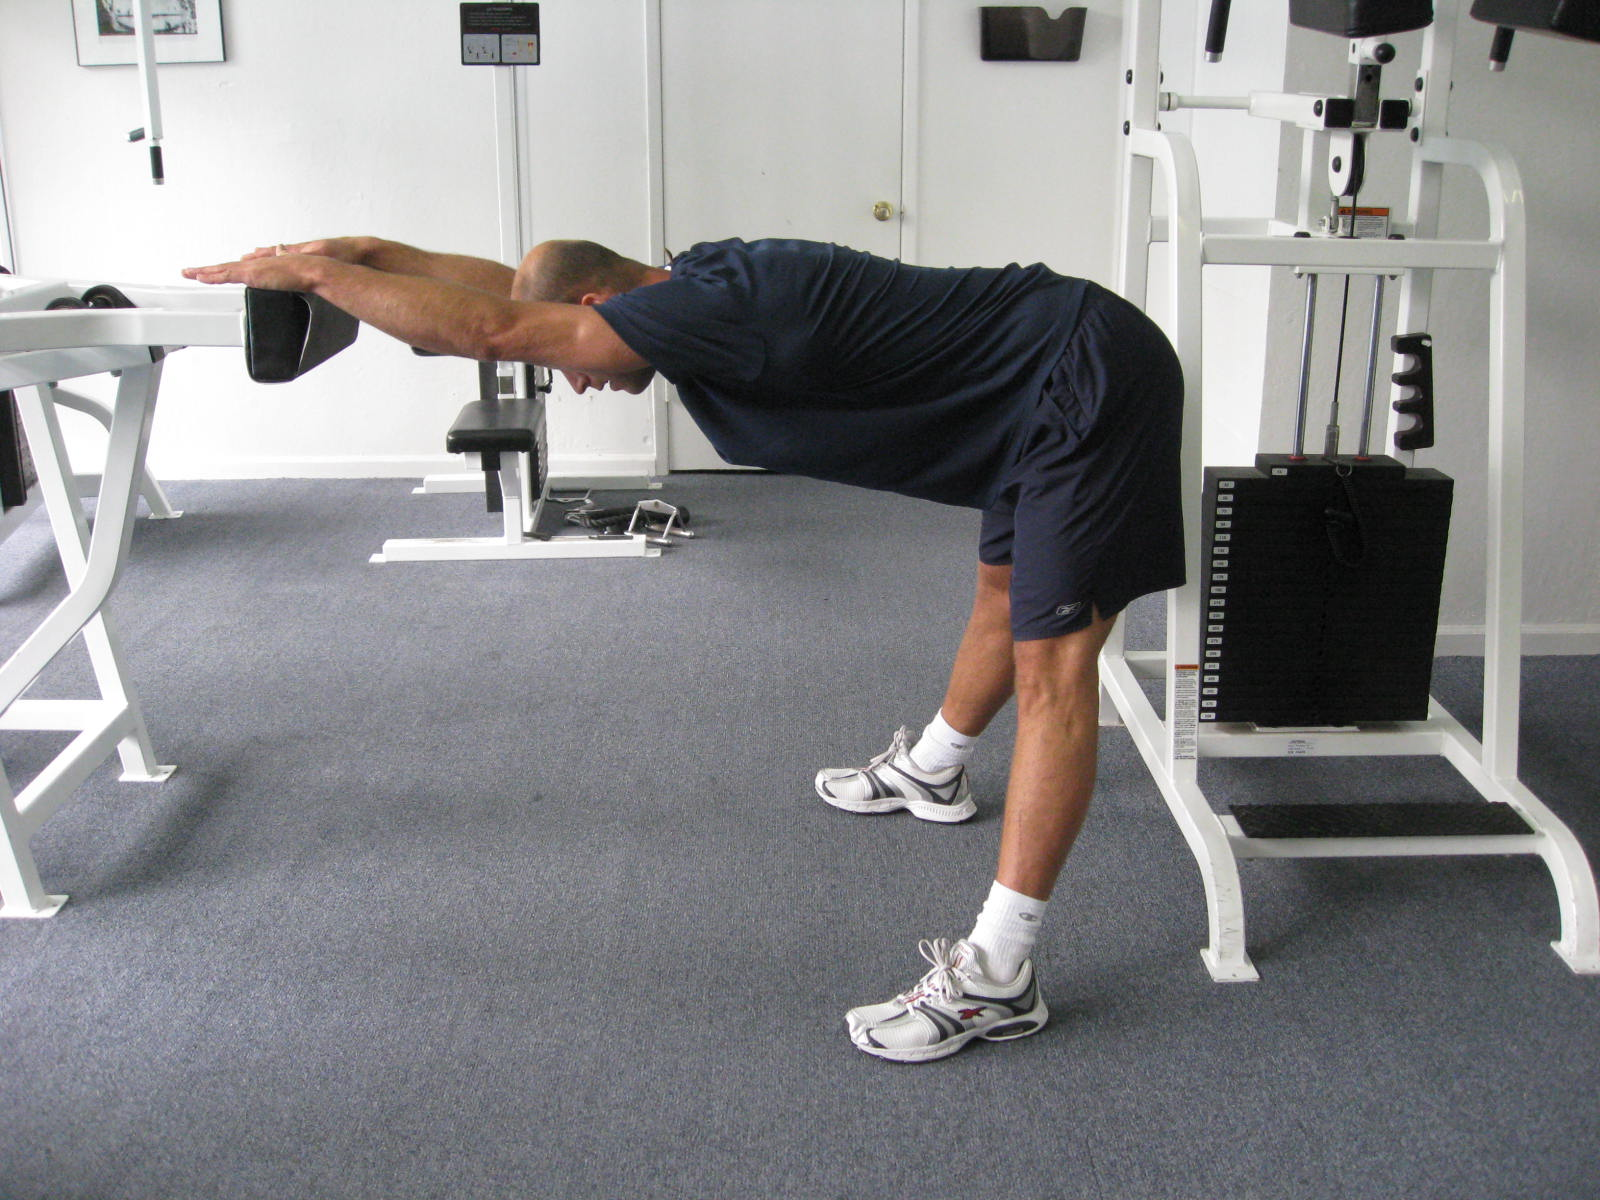 all body resistance workout - back stretch